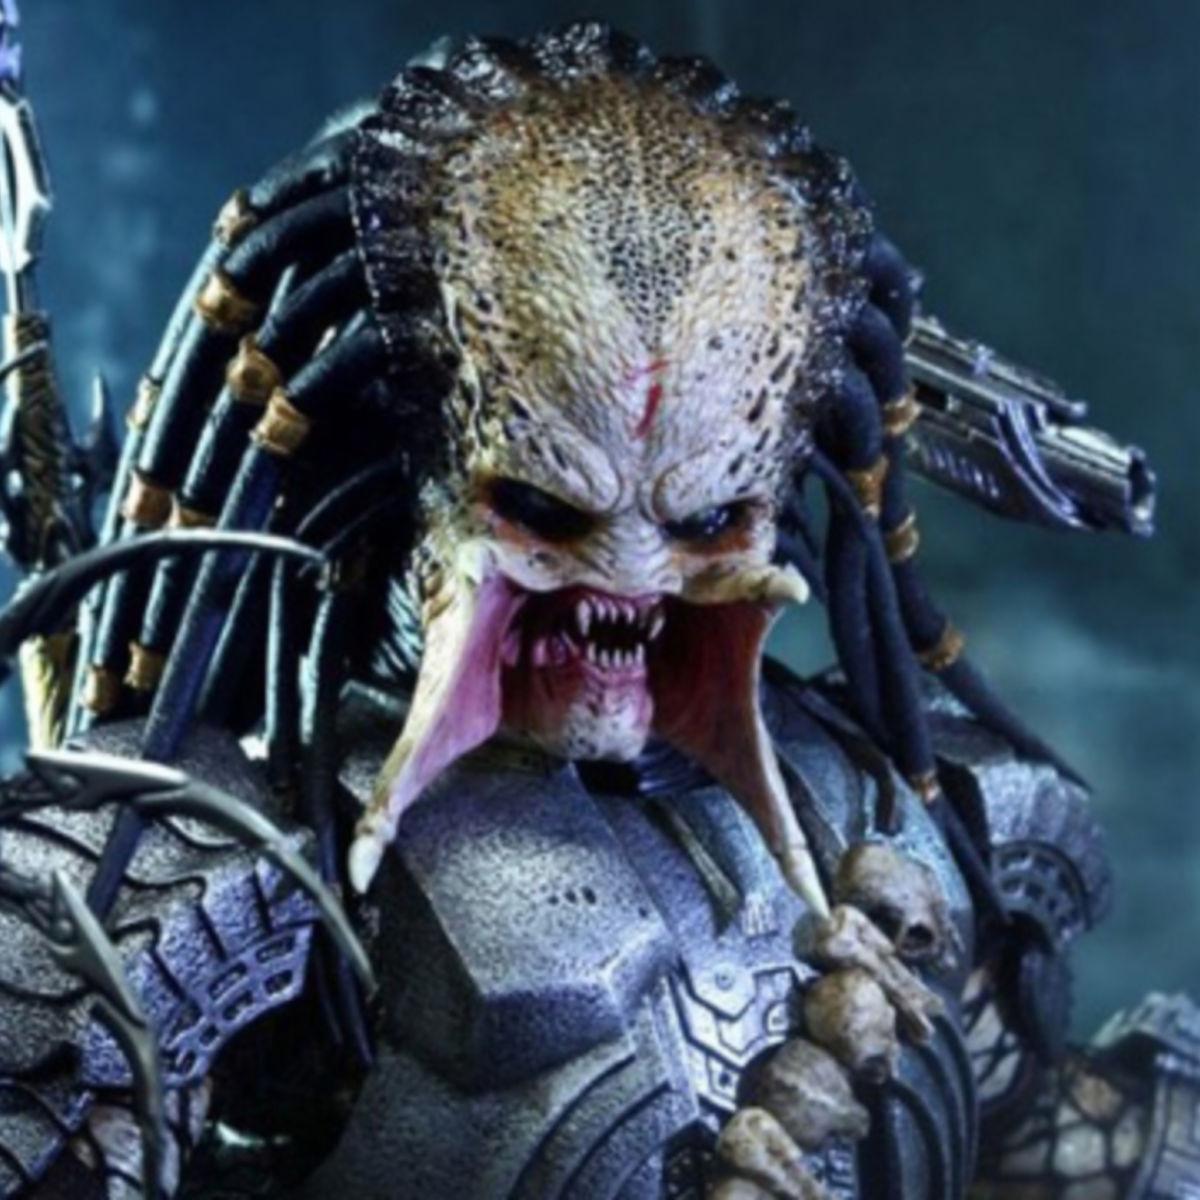 predator-2018-set-photo-spoilers-20001131-1280x0.jpg